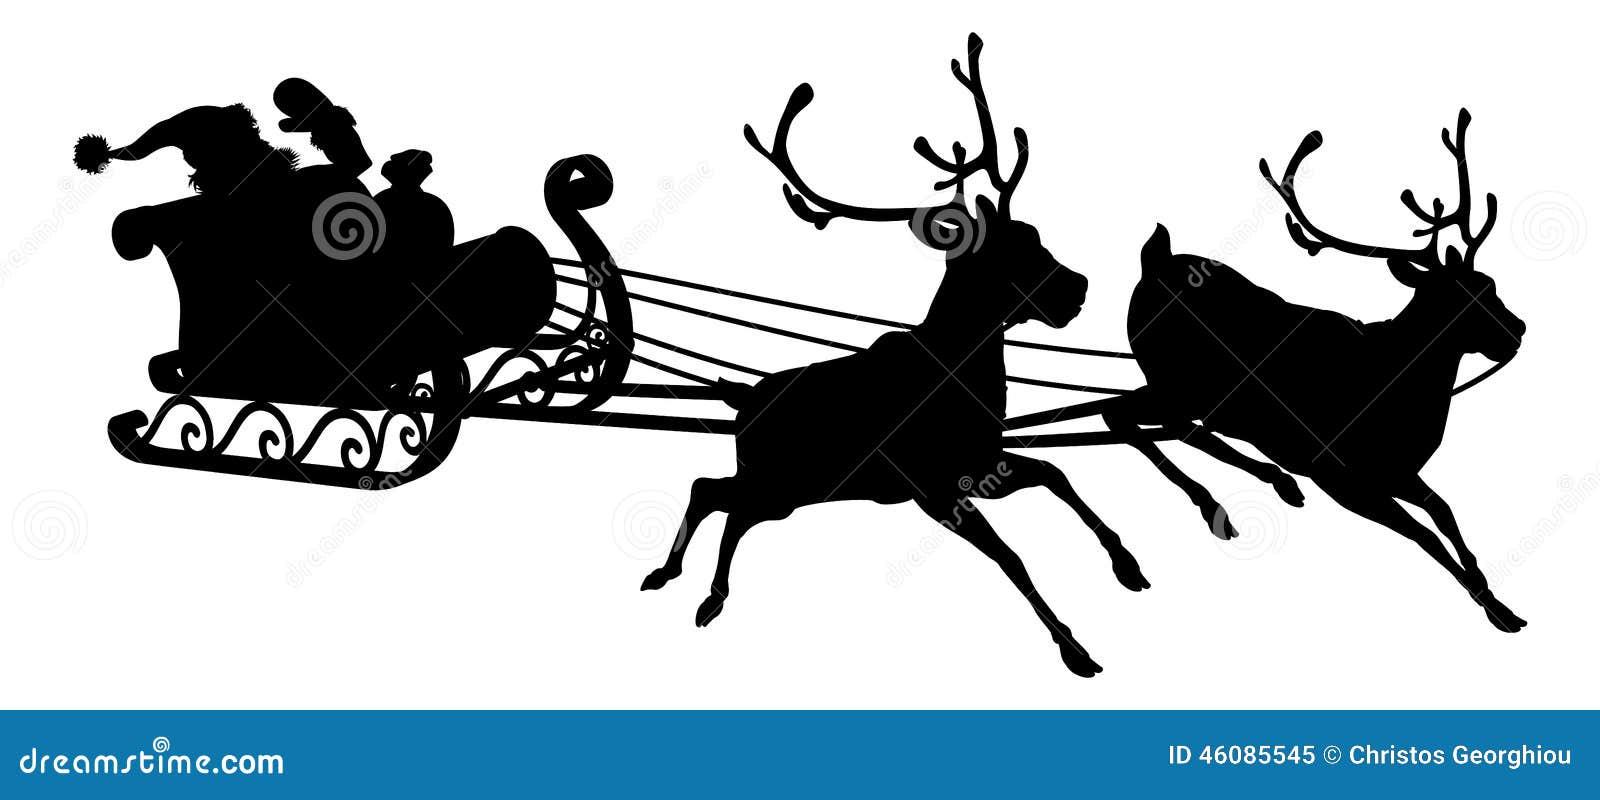 ... sleigh silhouette of waving Santa Claus in his sleigh and reindeer